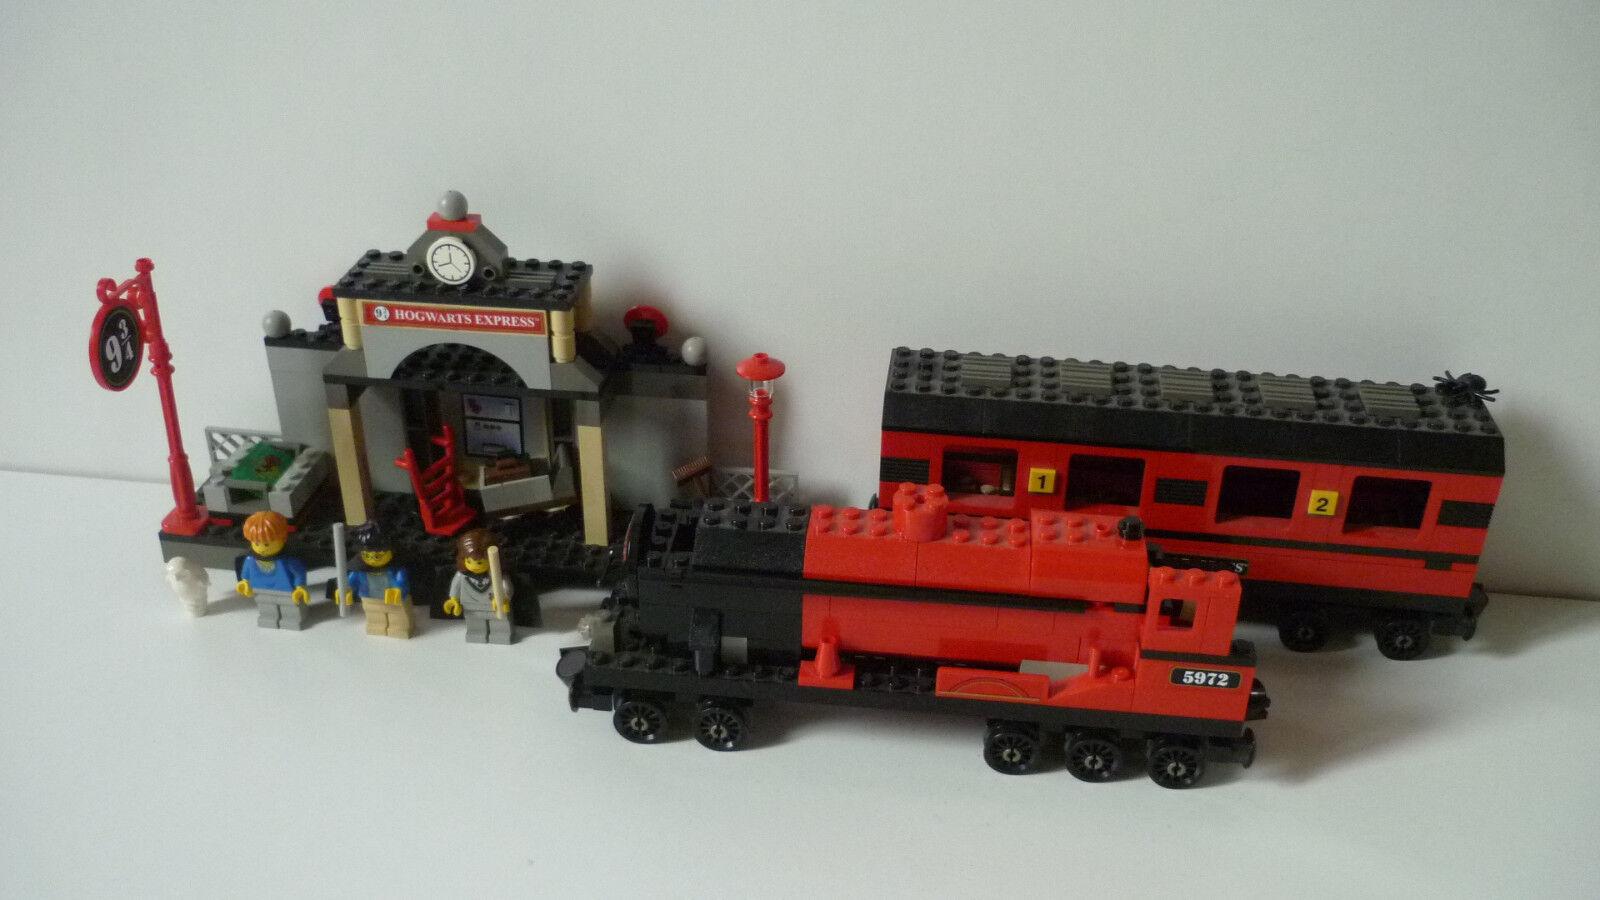 Lego Harry Potter / 4708 Hogwarts Express